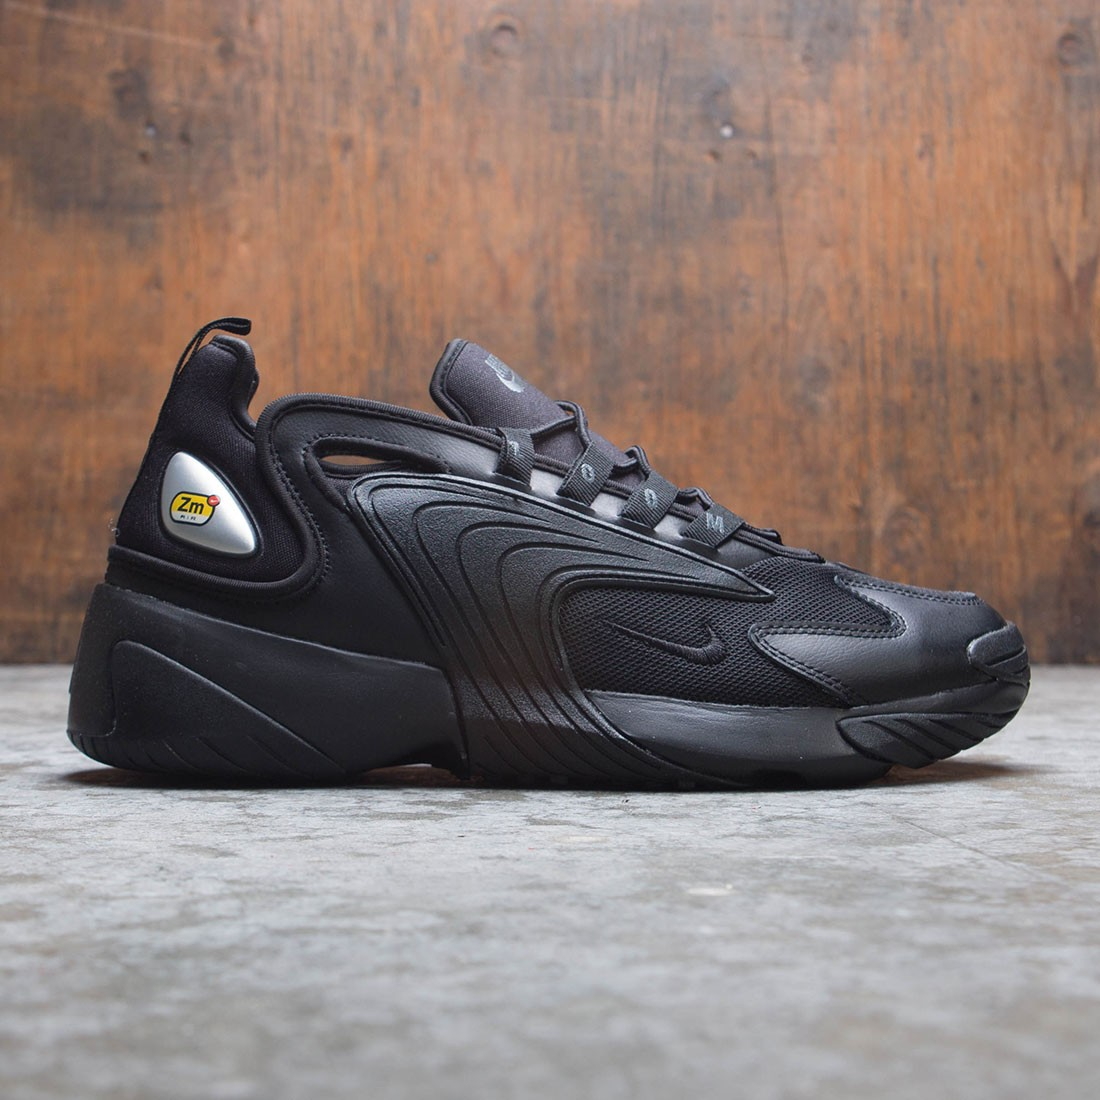 taille 40 5b9c4 4ccdd Nike Men Zoom 2K (black / black-anthracite)